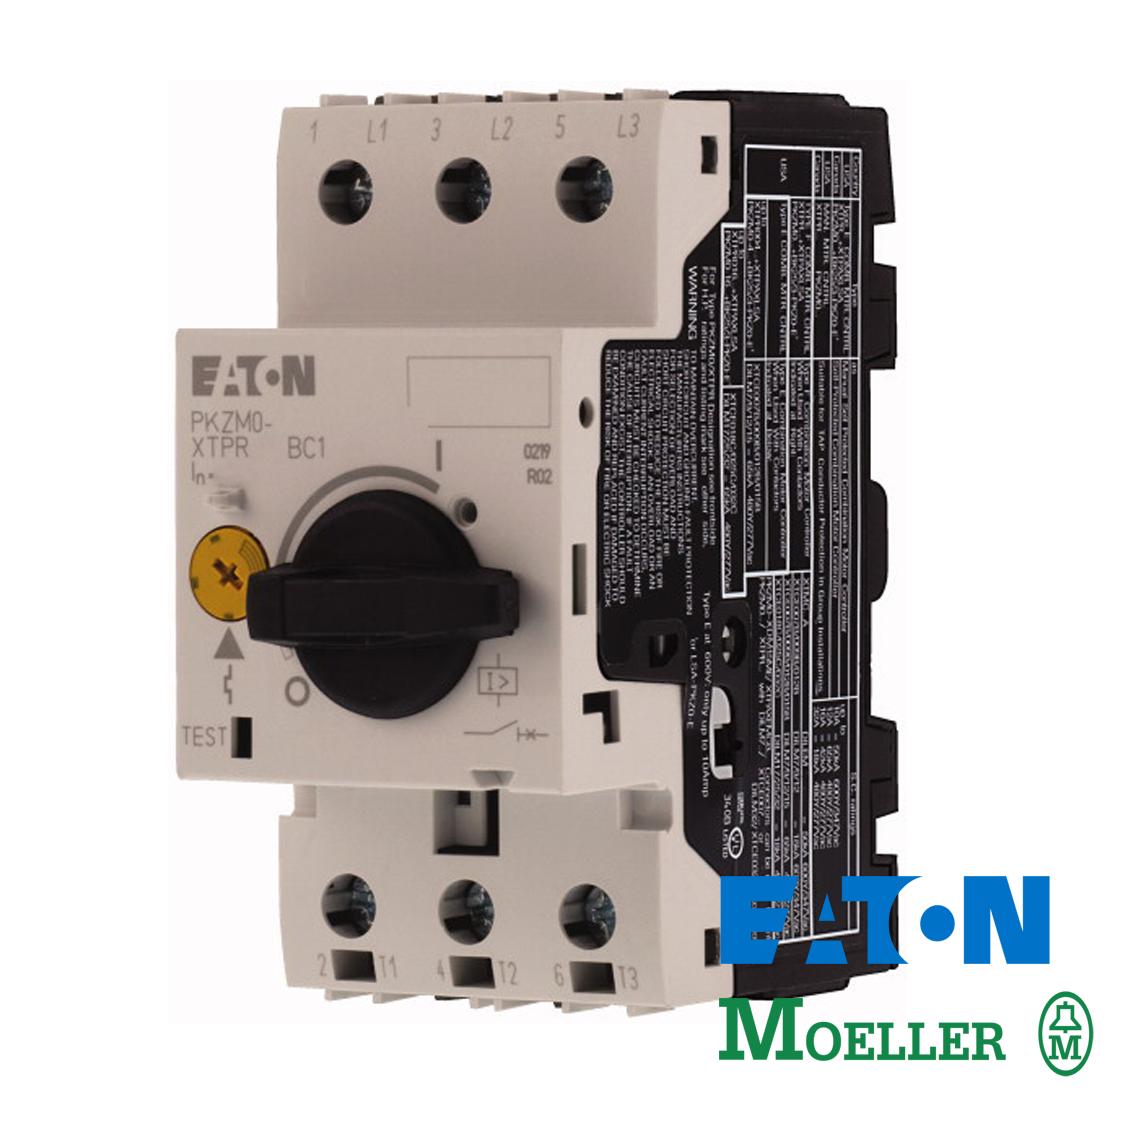 Motorni zaštitni prekidač PKZM0-10 Eaton-Moeller Elektro Vukojevic